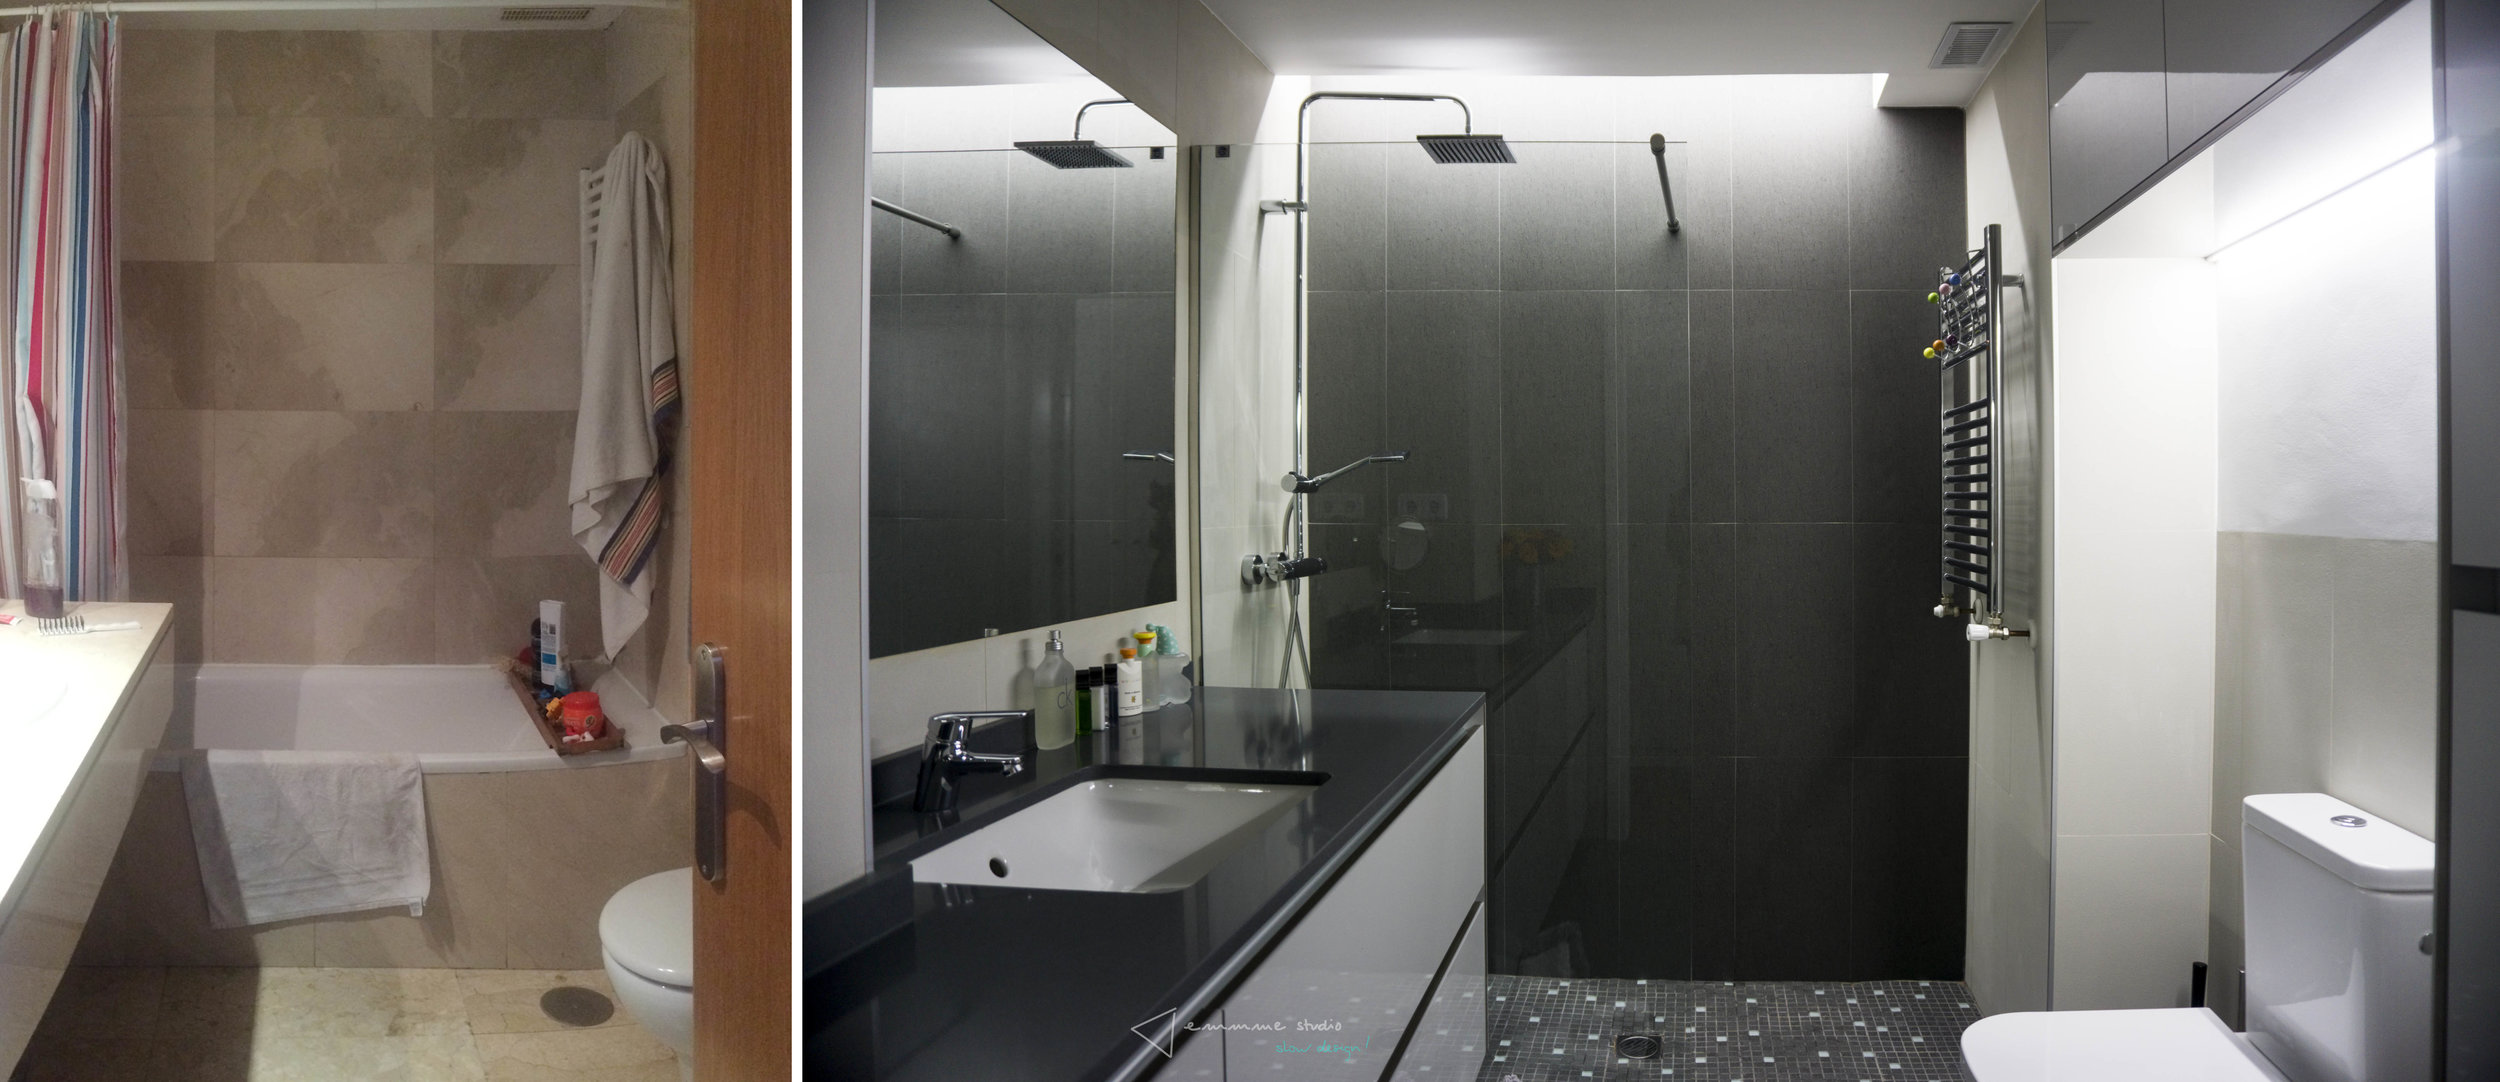 diseño reformas slow emmme studio baño principal Teresa y Jose Luis - 02 - CM.jpg